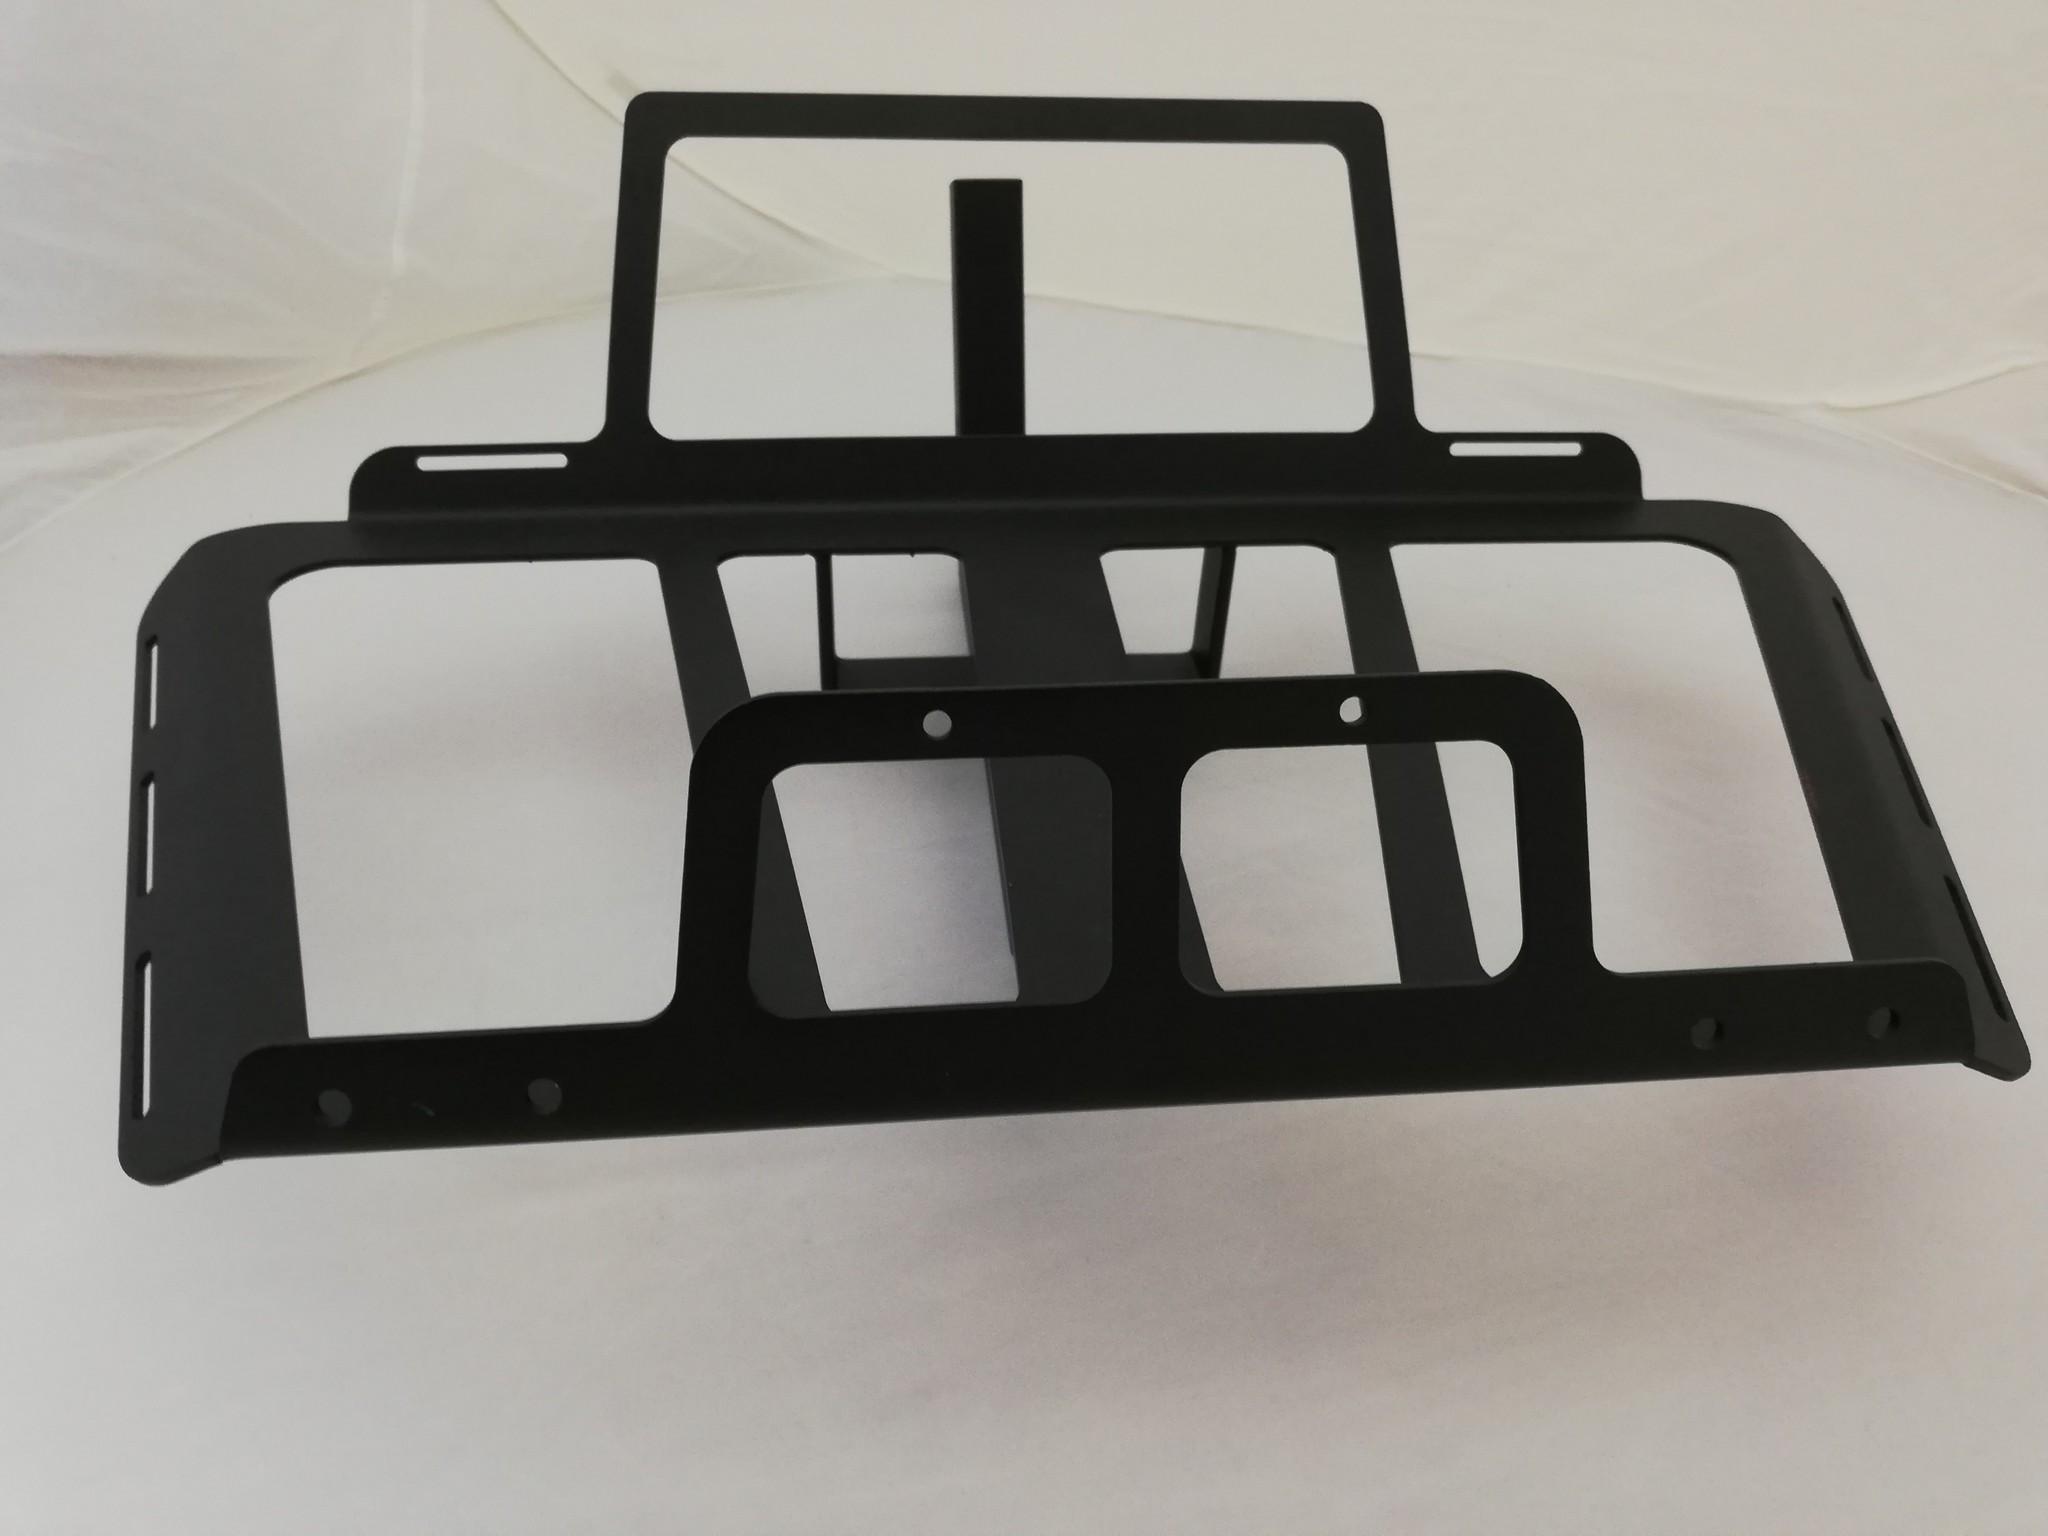 JVR Products Edelstahl-Heckträger GL1800 model 2018 mattschwarz